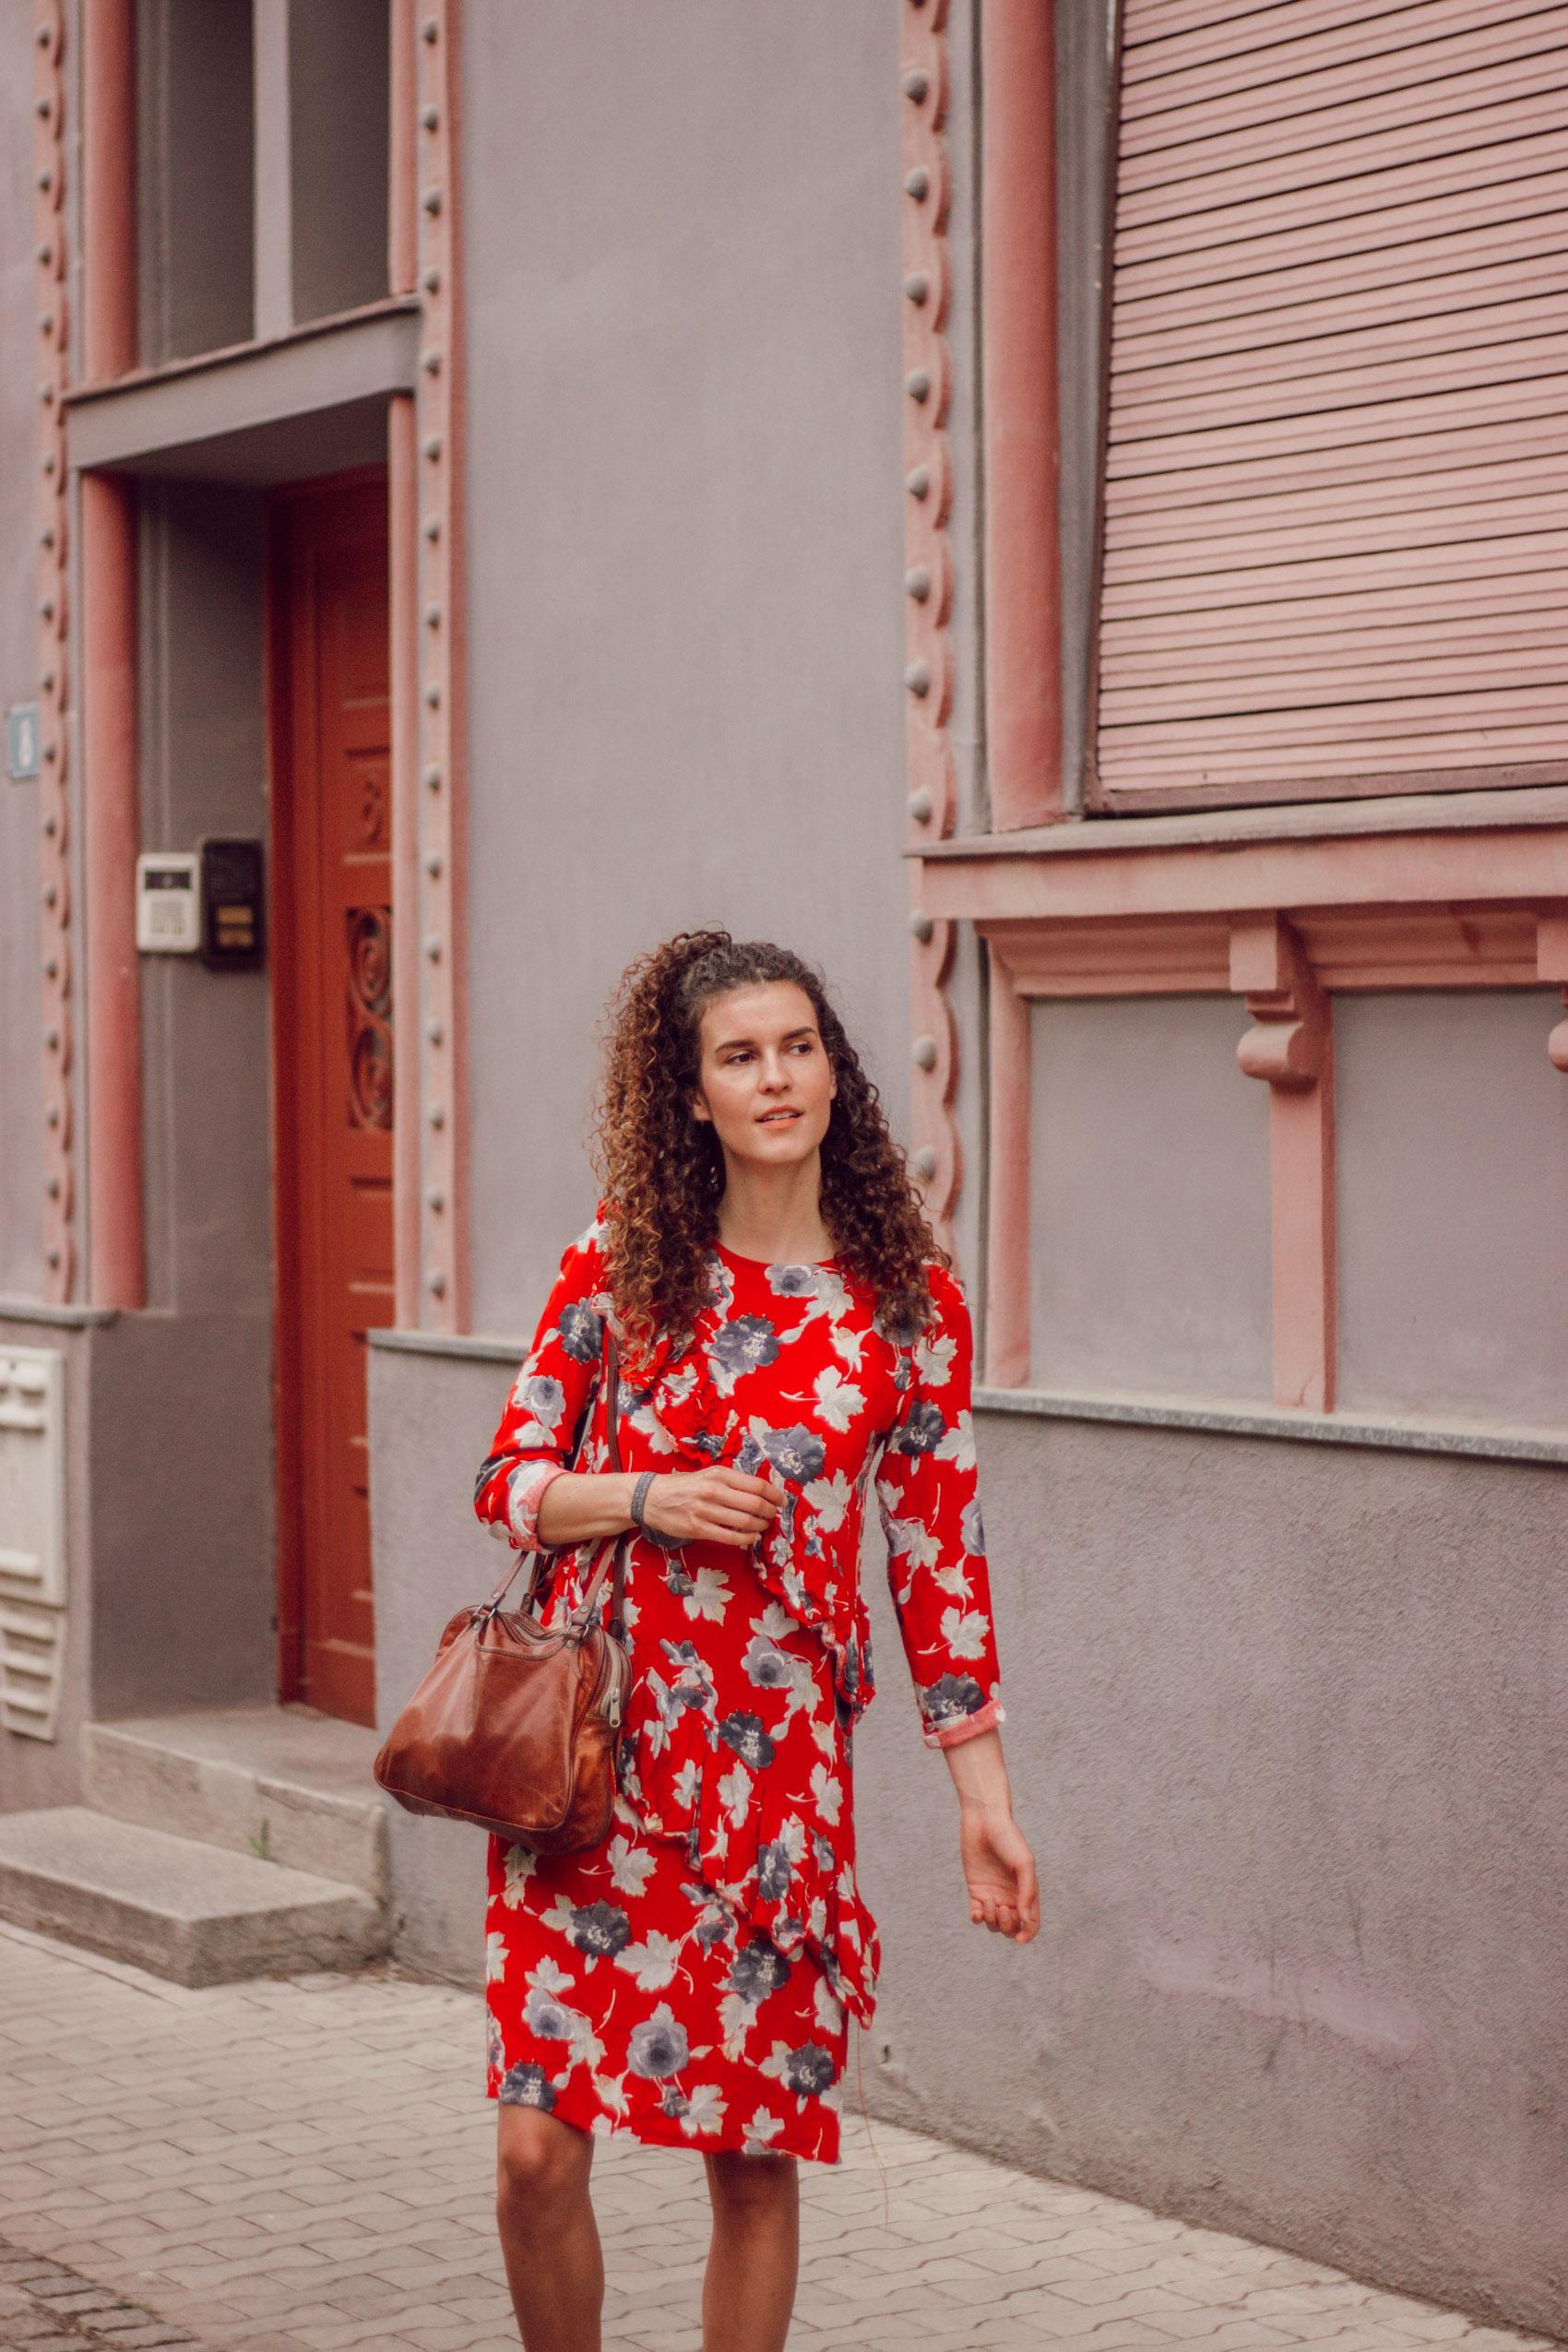 Rotes Kleid Outfit  toronto 2022